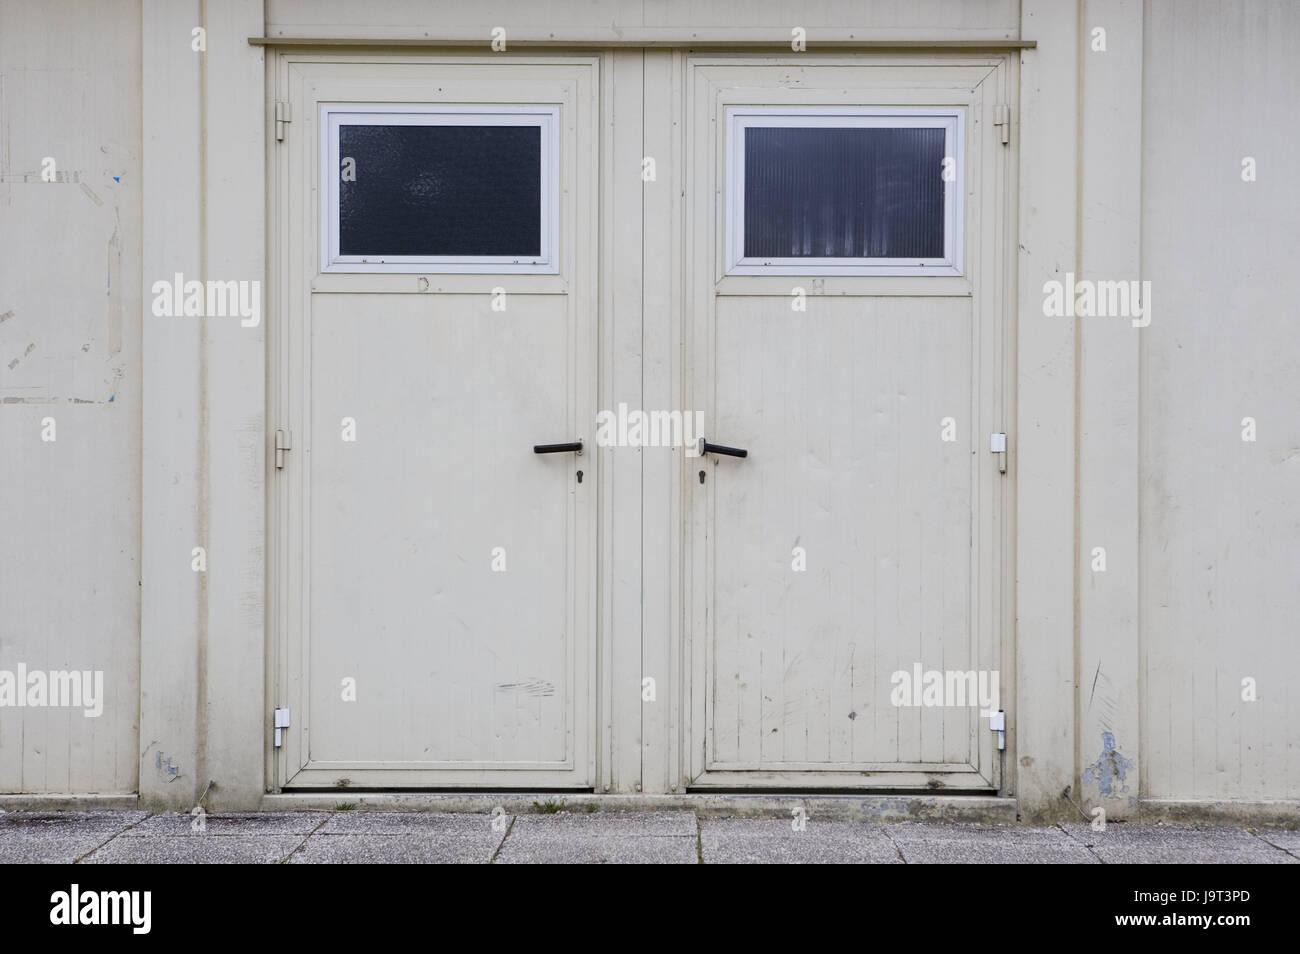 Factory buildingdoorsclosedbuildingoldwhitefacademetal doorsiron doorsdouble doorinputexiton the lefton the rightconceptionchoicedecision ... & Factory buildingdoorsclosedbuildingoldwhitefacademetal Stock ...